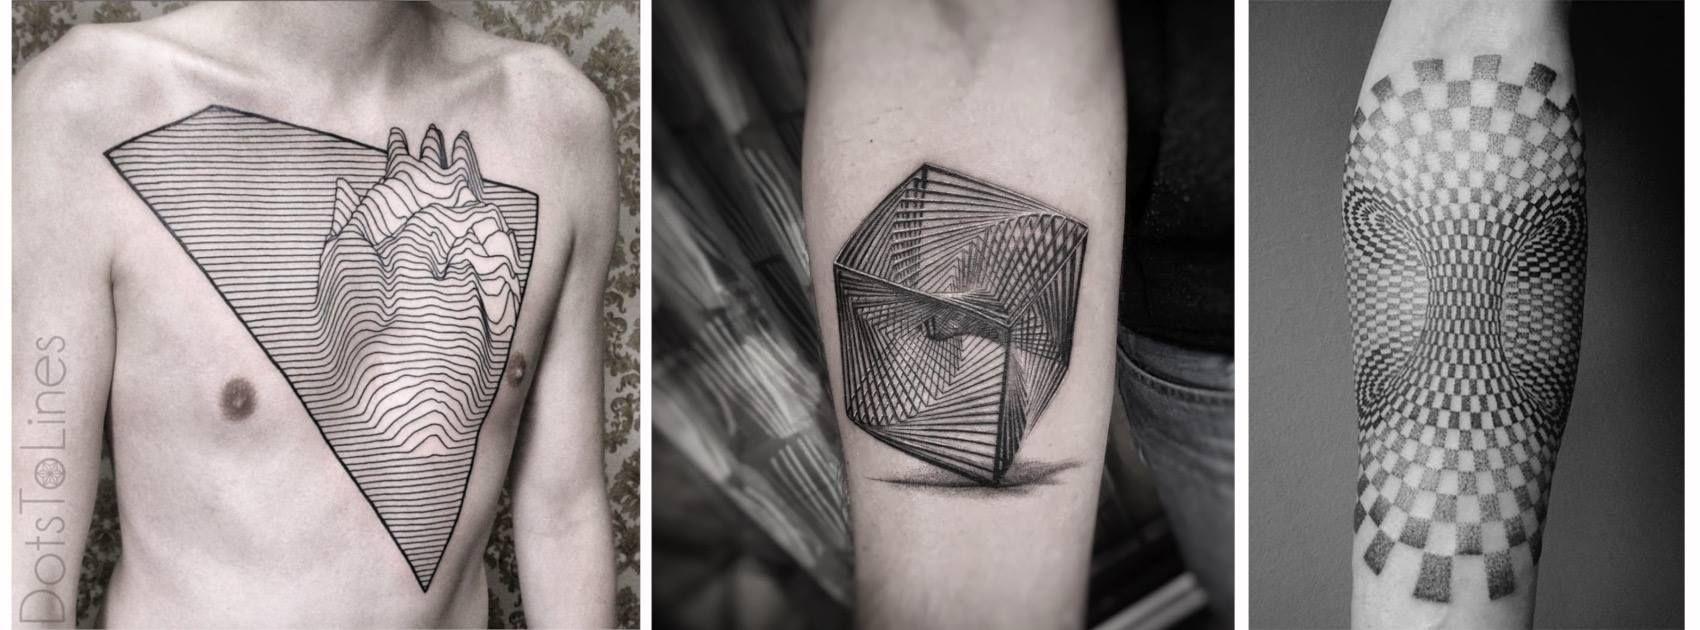 Formas Geometricas Tattoo Designs